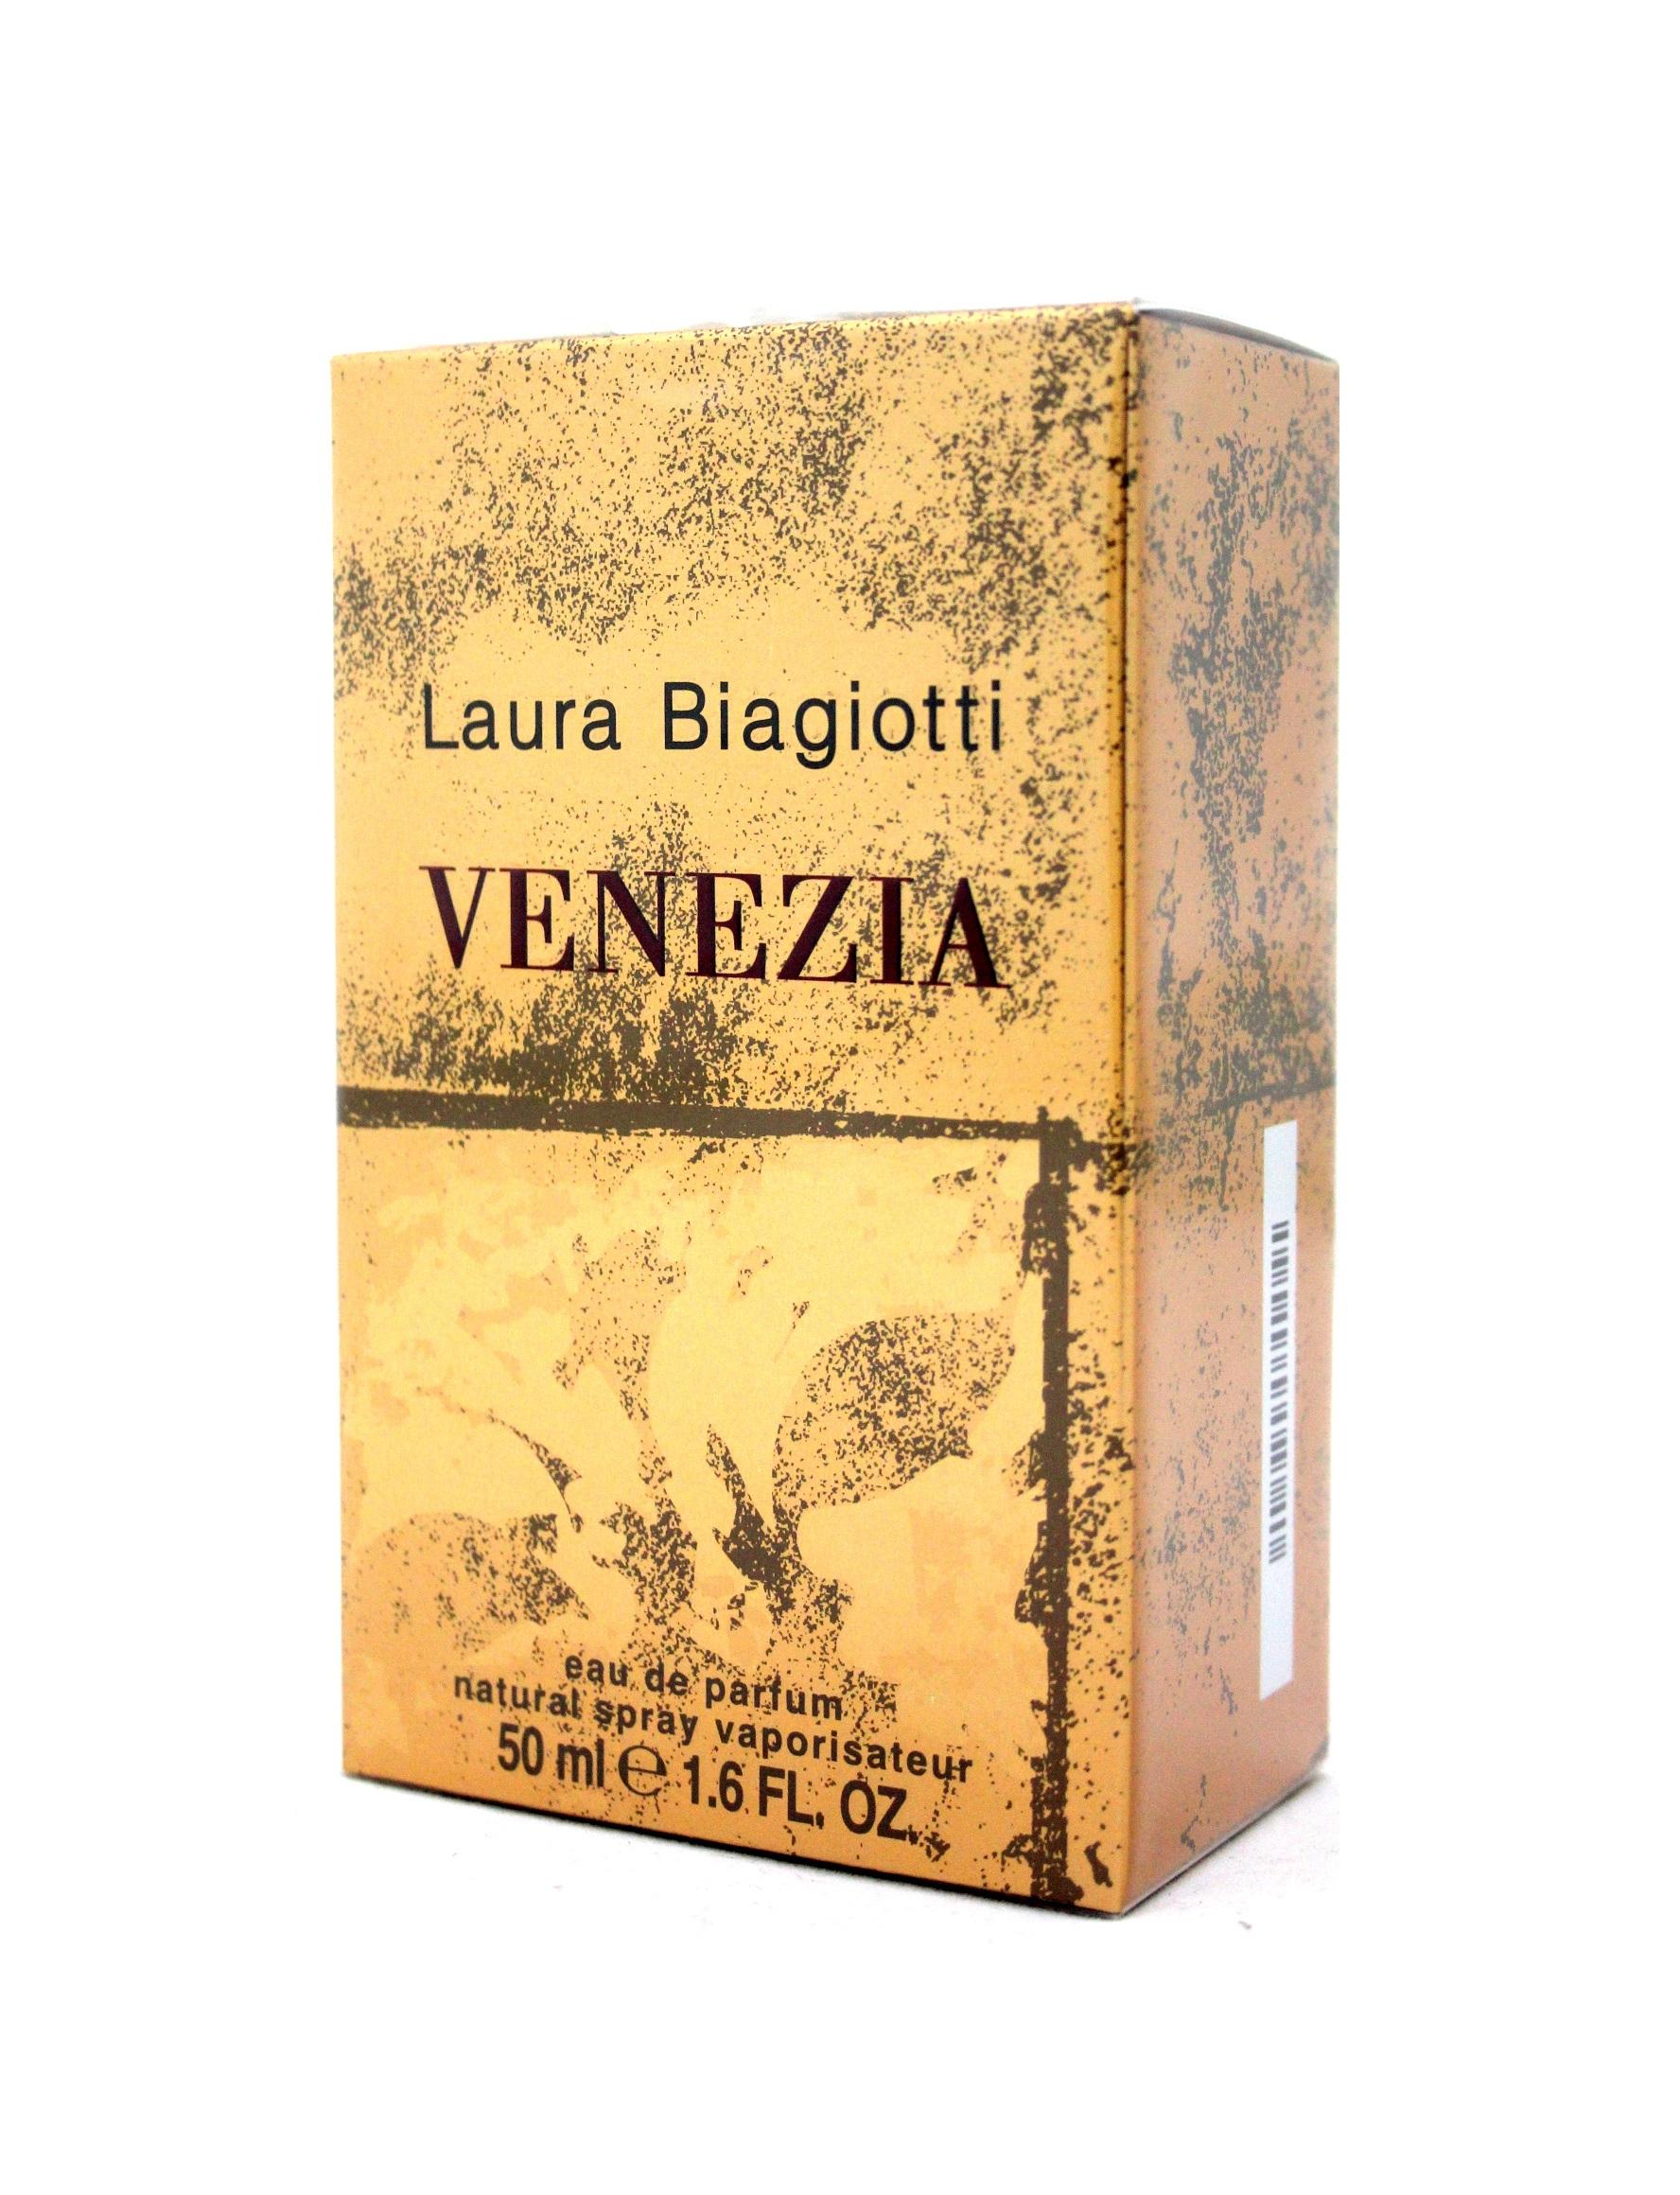 laura biagiotti venezia 2011 eau de parfum edp for women. Black Bedroom Furniture Sets. Home Design Ideas